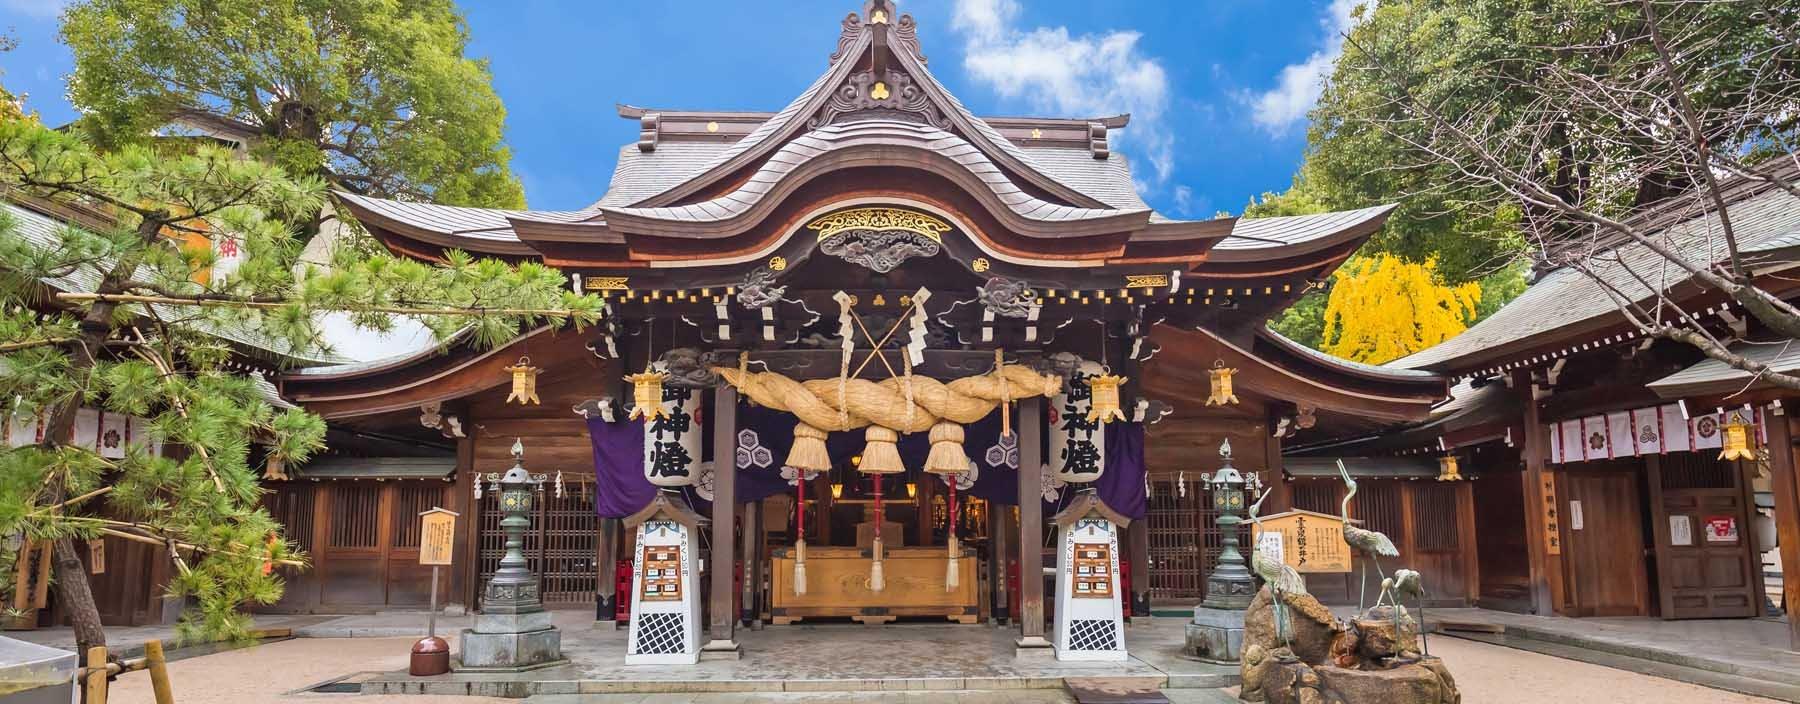 jp, fukuoka, tocho-ji temple.jpg